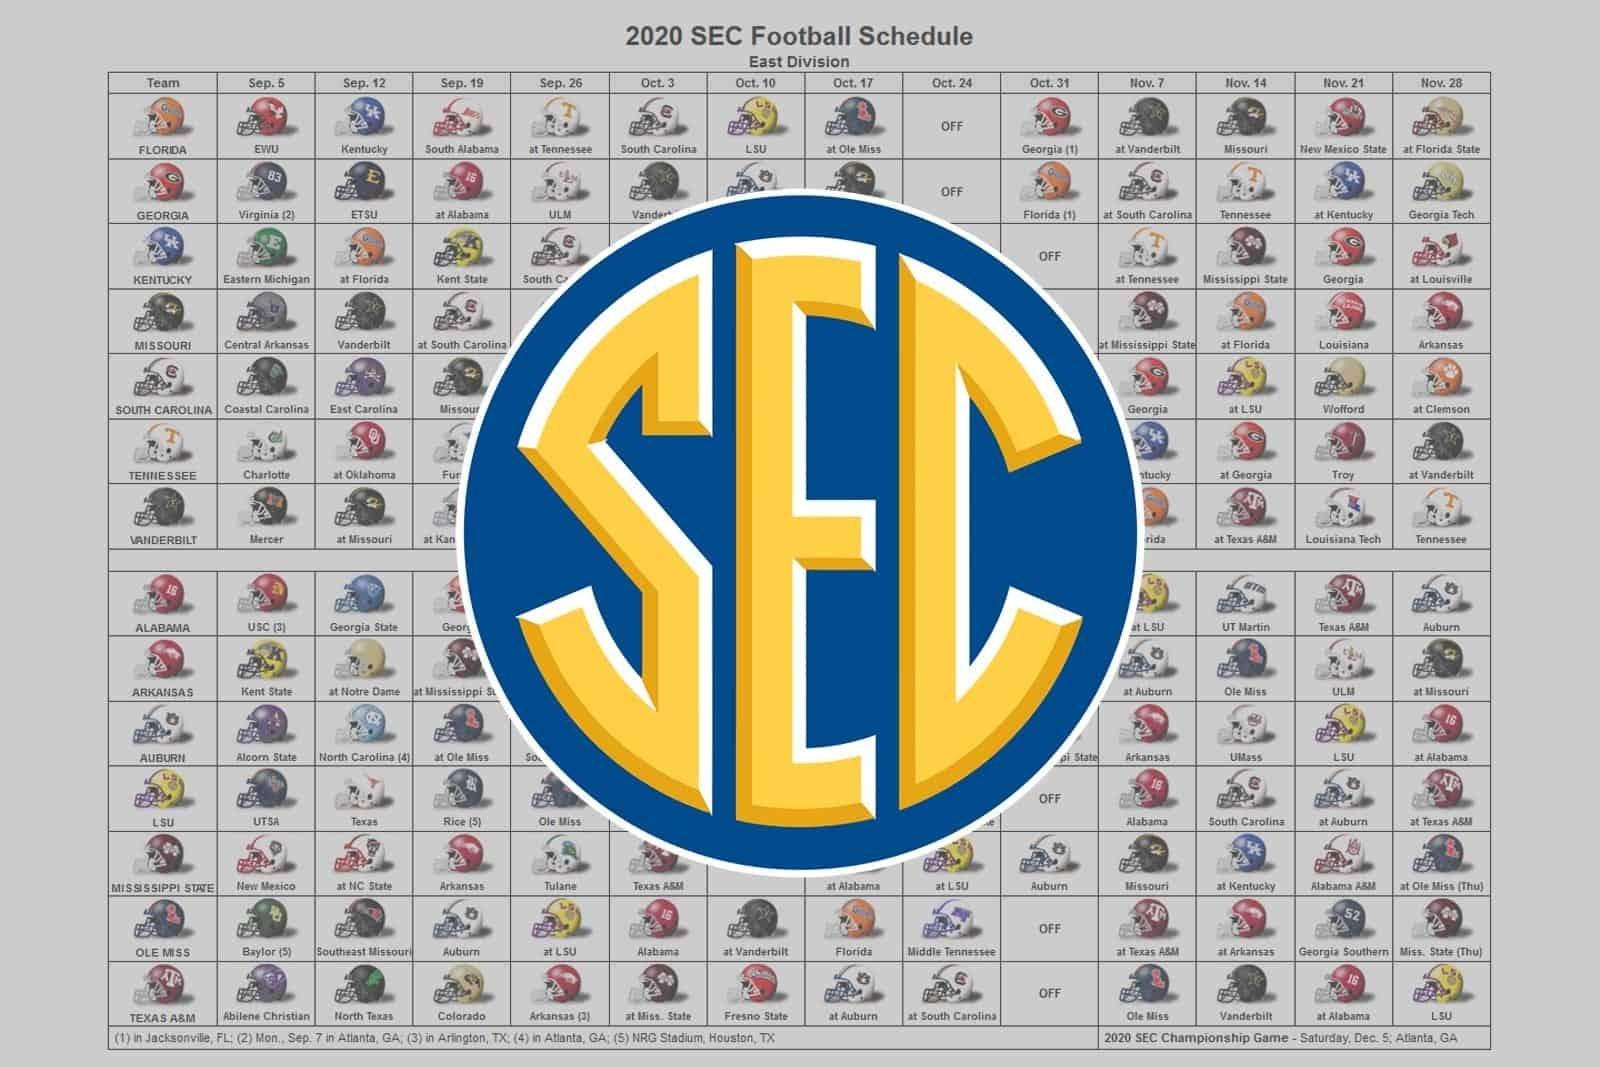 2020 Sec Football Helmet Schedule for Free Printable Nfl Schedule 2019 2020